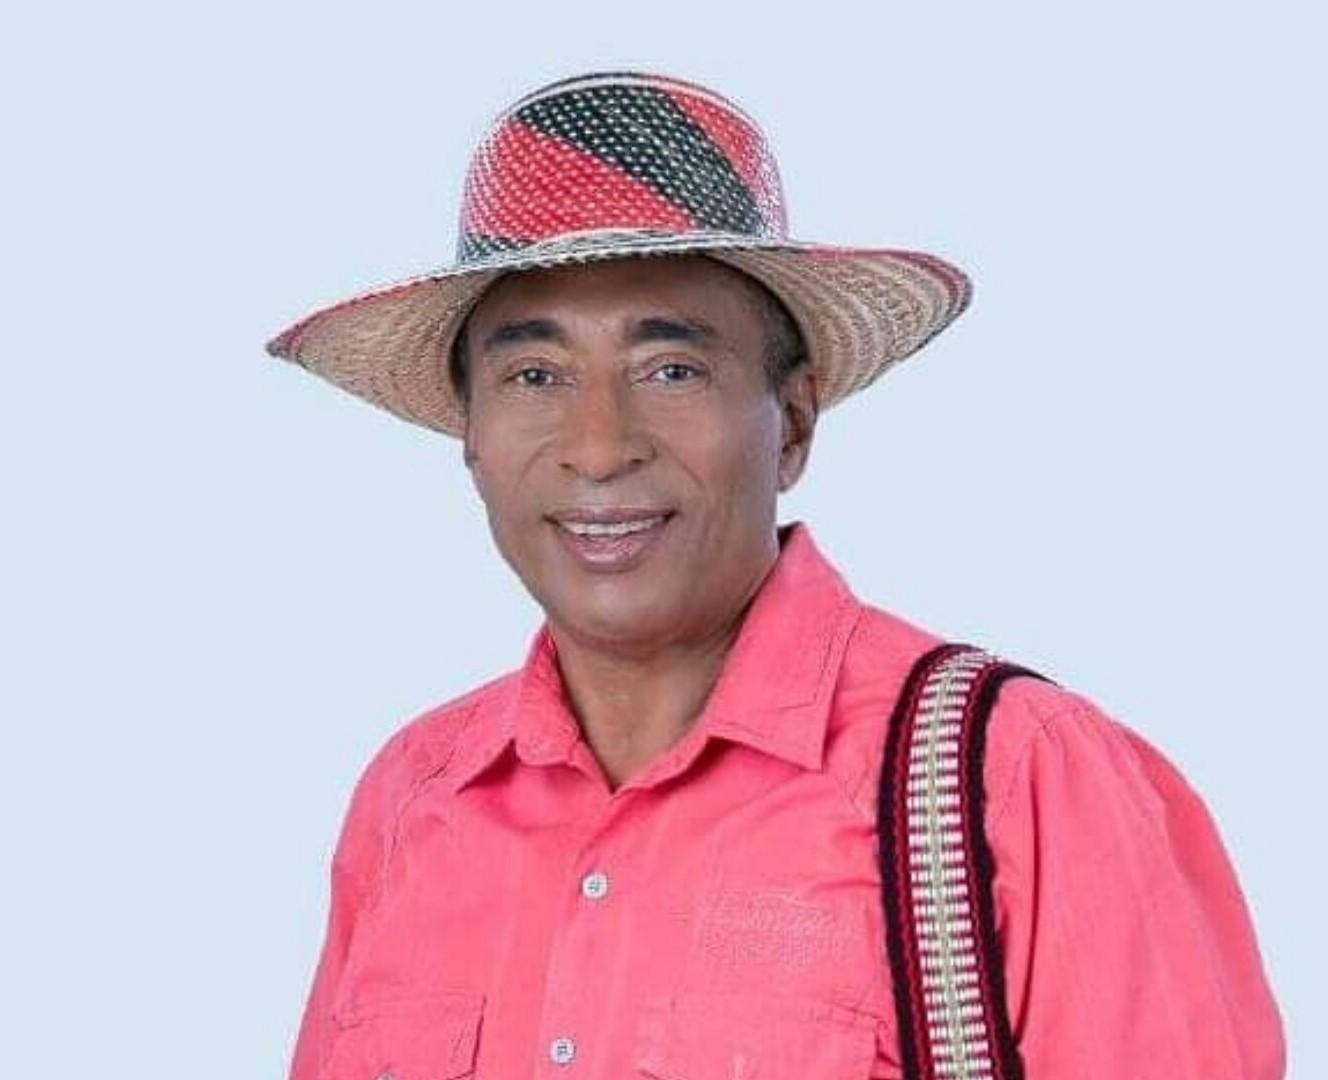 https://www.notasrosas.com/Romualdo Brito: Vida, Obra y Éxitos